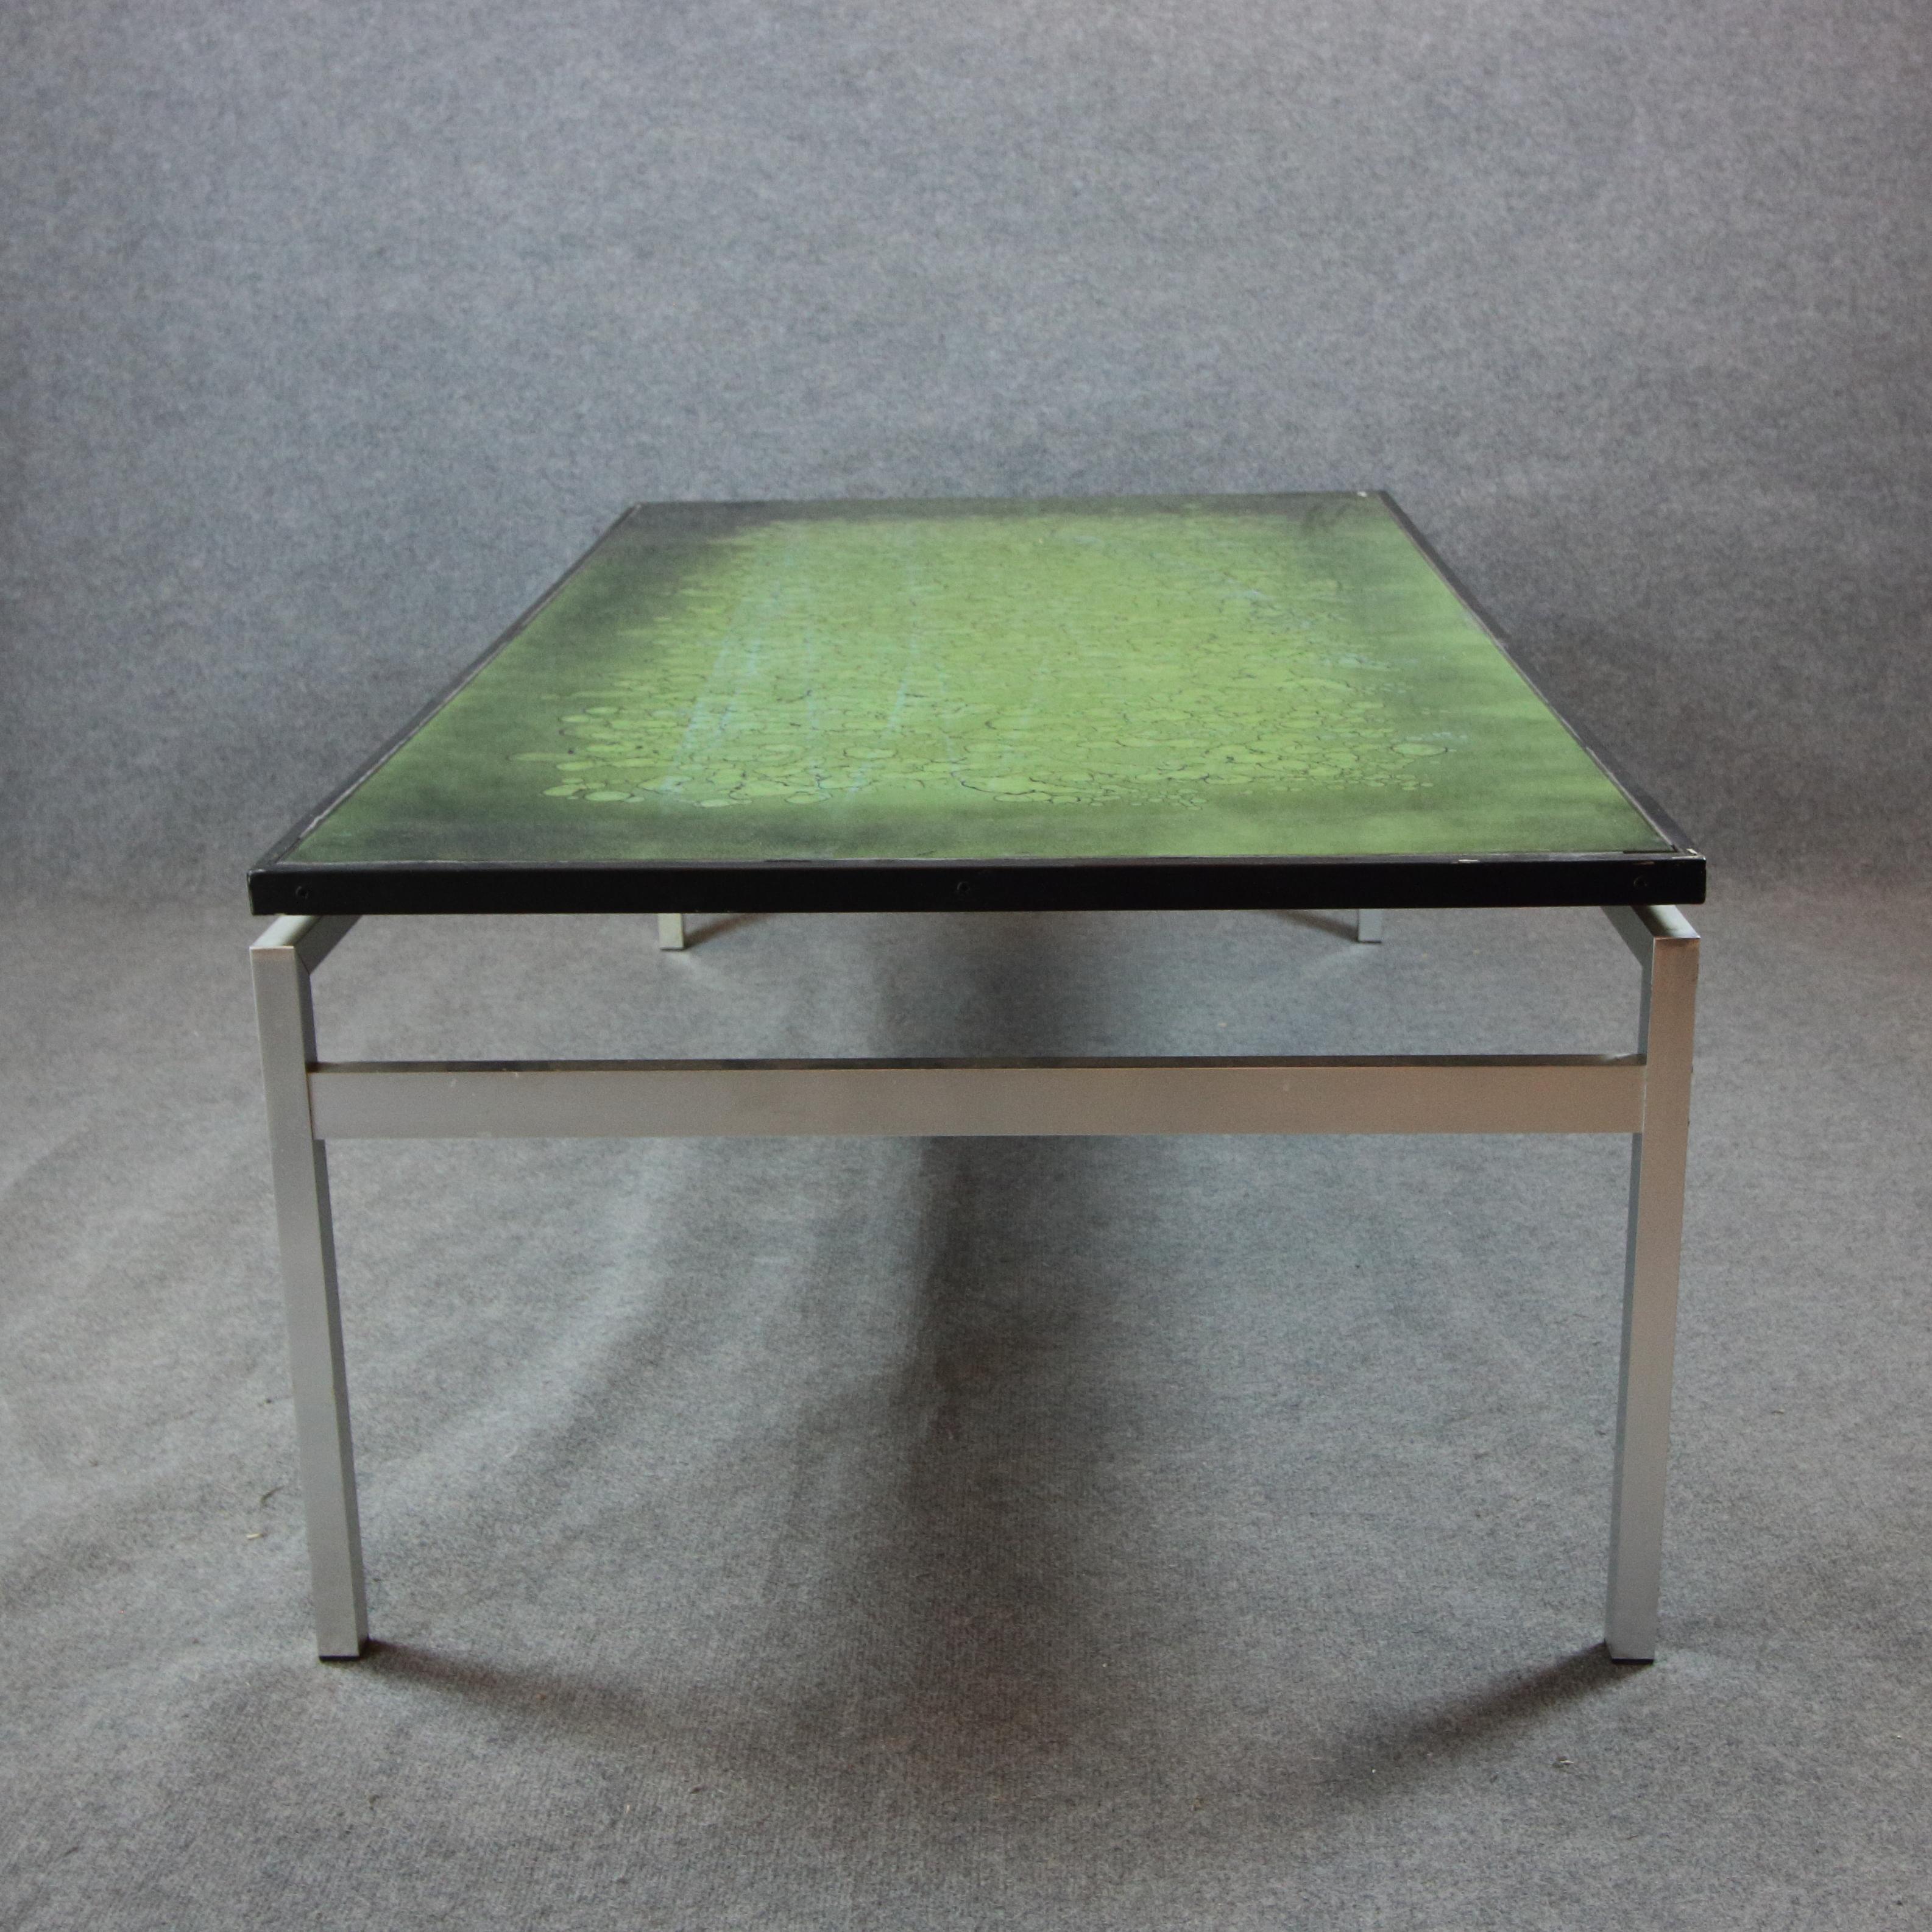 Soffbord, emaljerad glasskiva, metallunderrede, signerad J